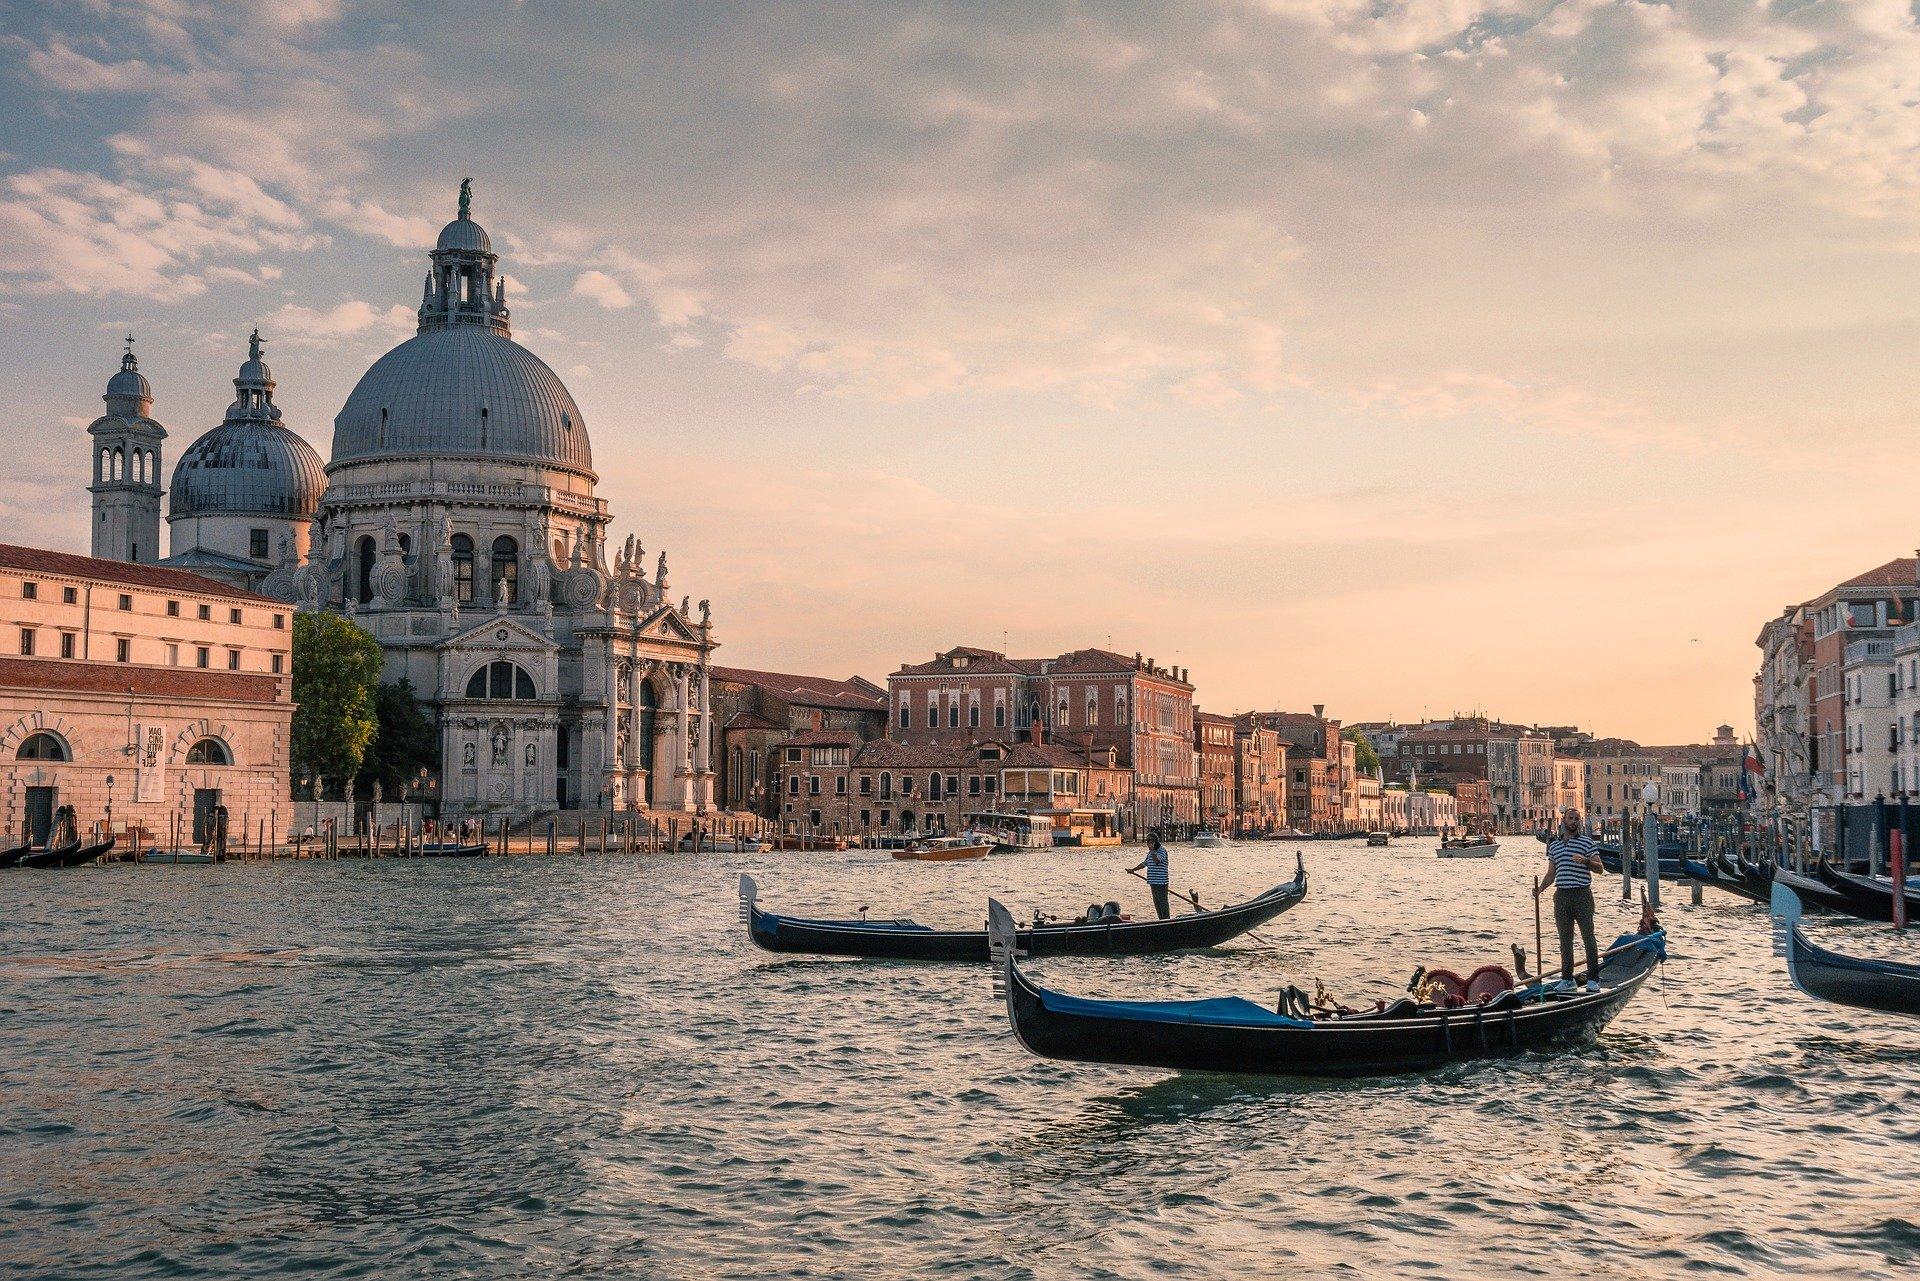 Gondolas on Canal Grande in Venezia